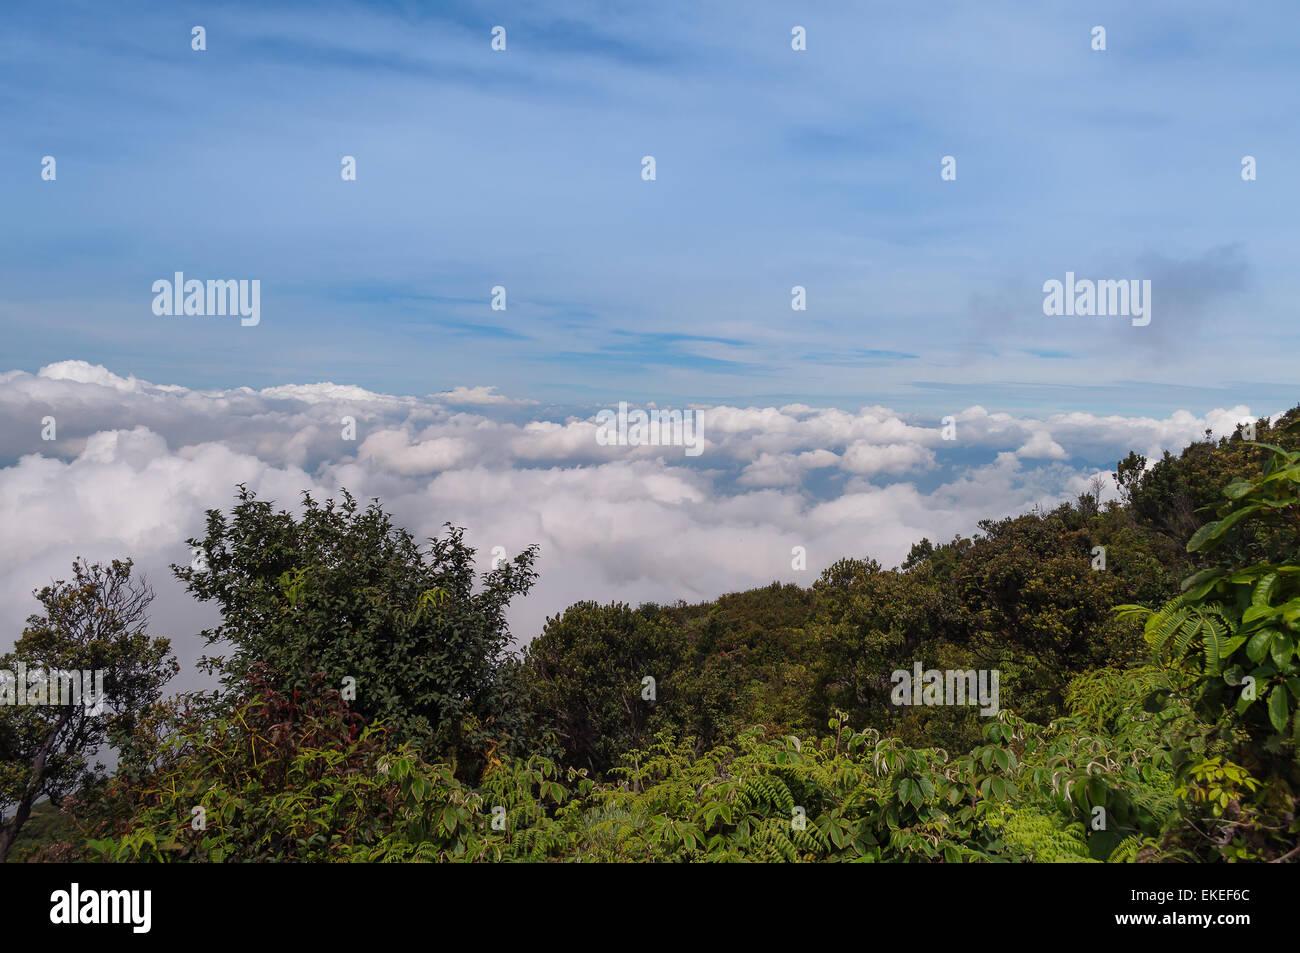 Clouds over Mountain. Volcano Mount Merapi. West Sumatra. Indonesia - Stock Image